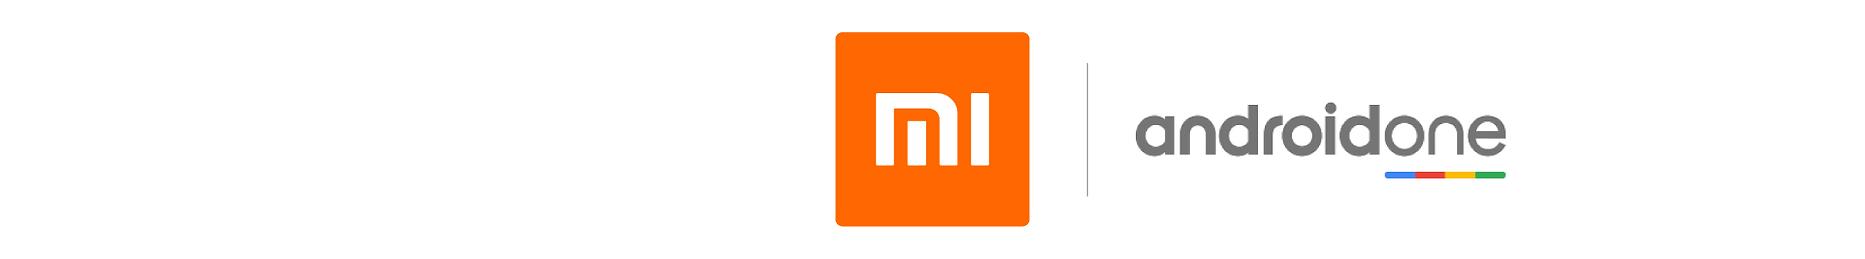 Xiaomi-Banner-2.png